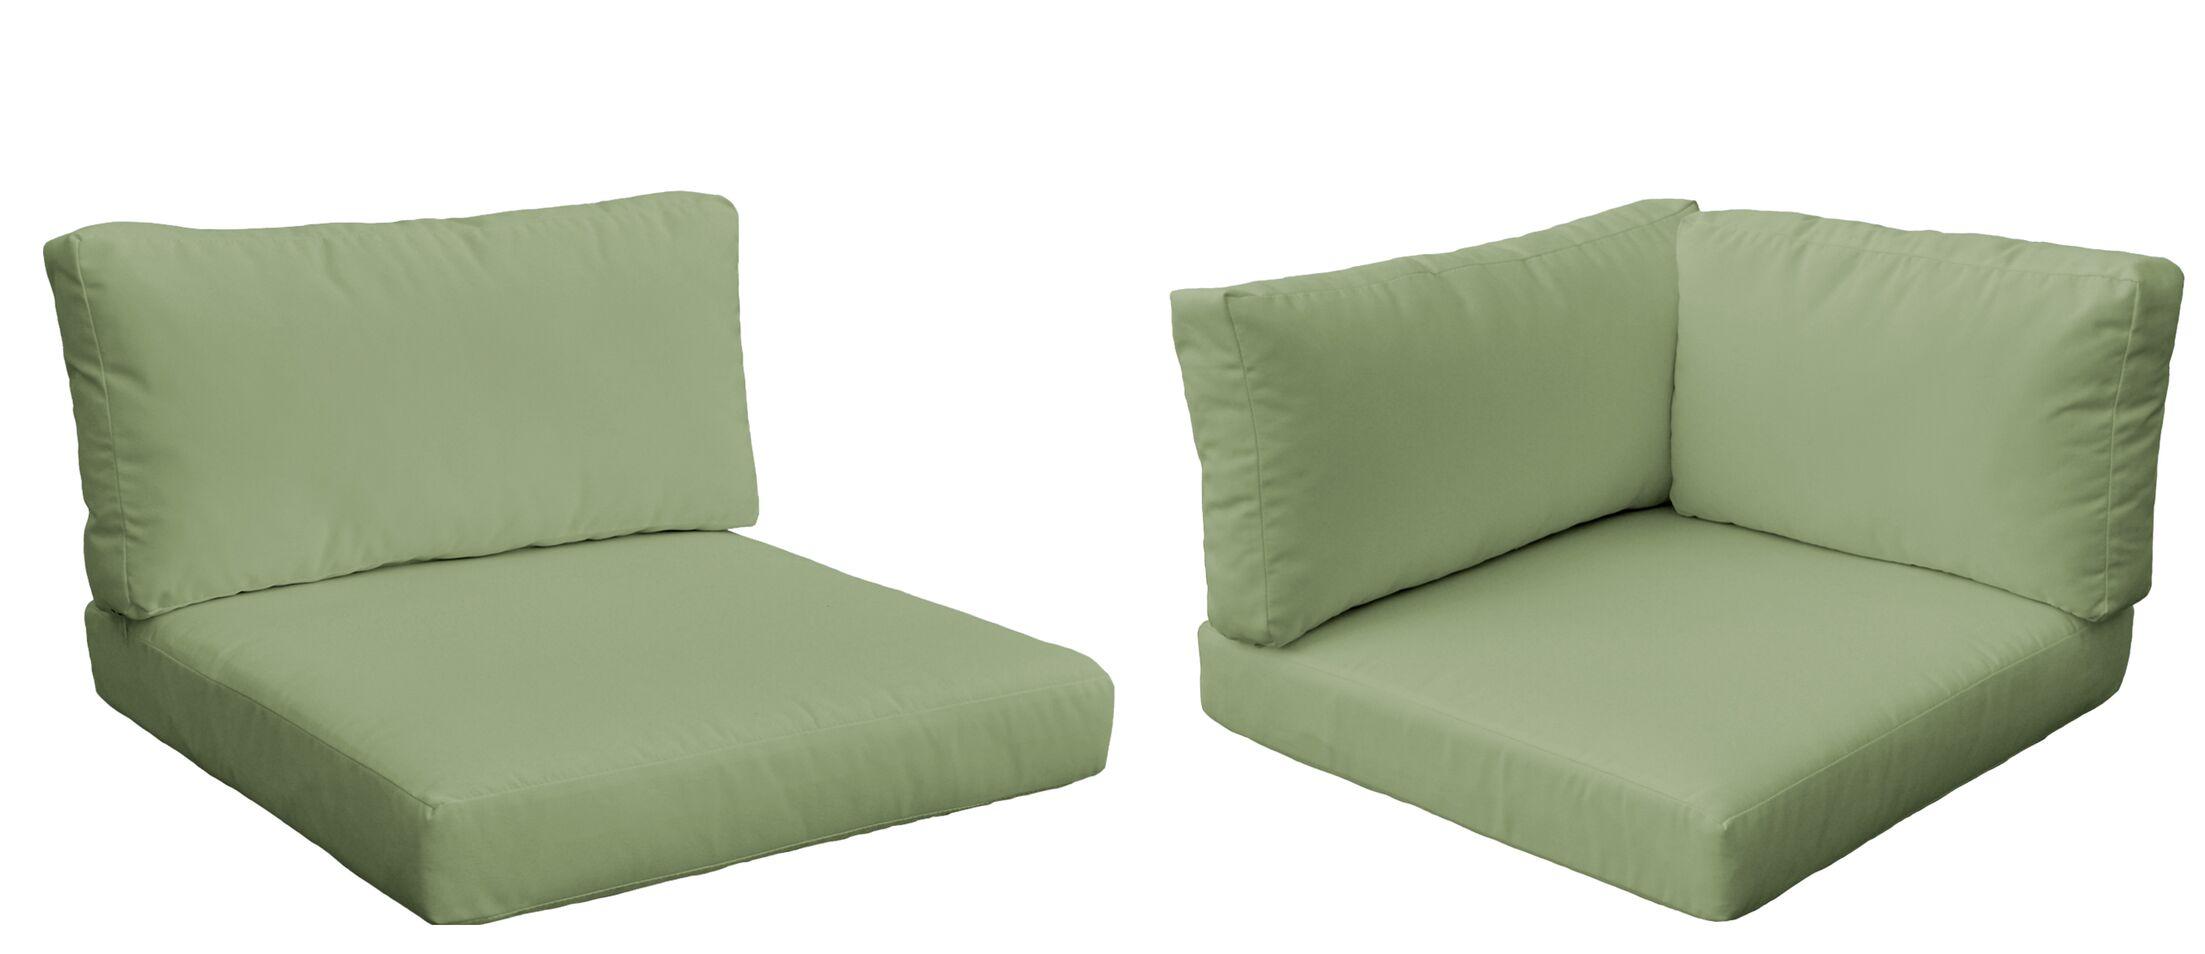 Monaco Outdoor 10 Piece Lounge Chair Cushion Set Fabric: Cilantro